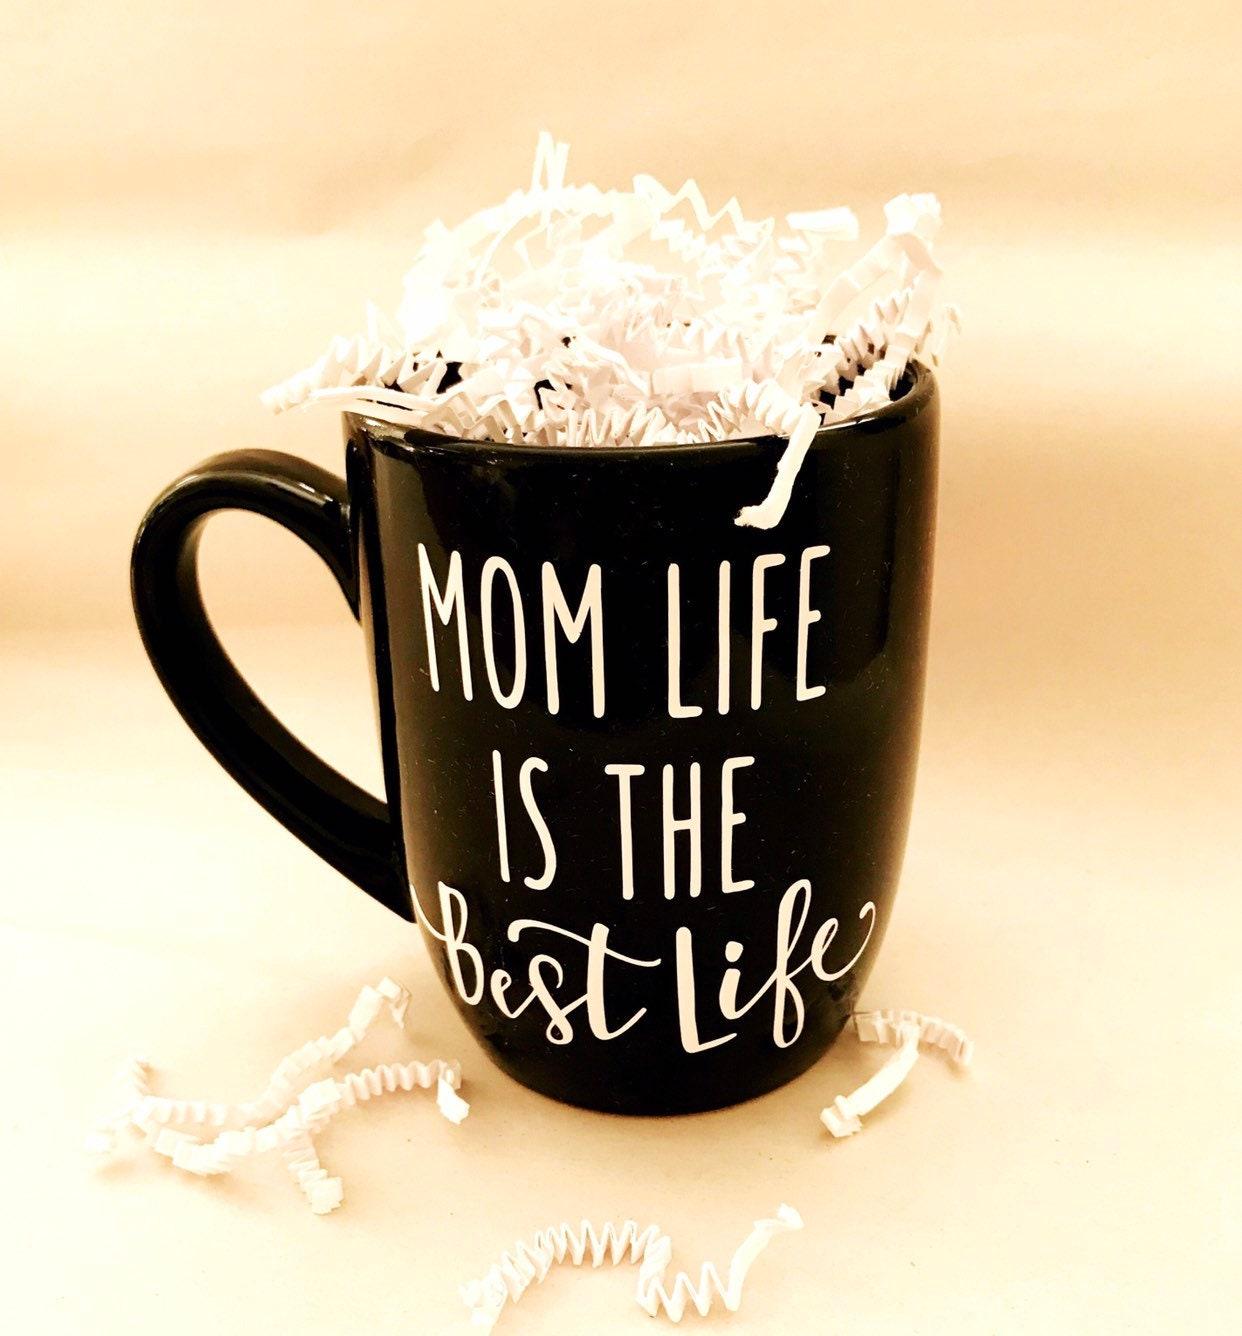 mom life is the best life cup, mom life coffee mug, Christmas gifts ...